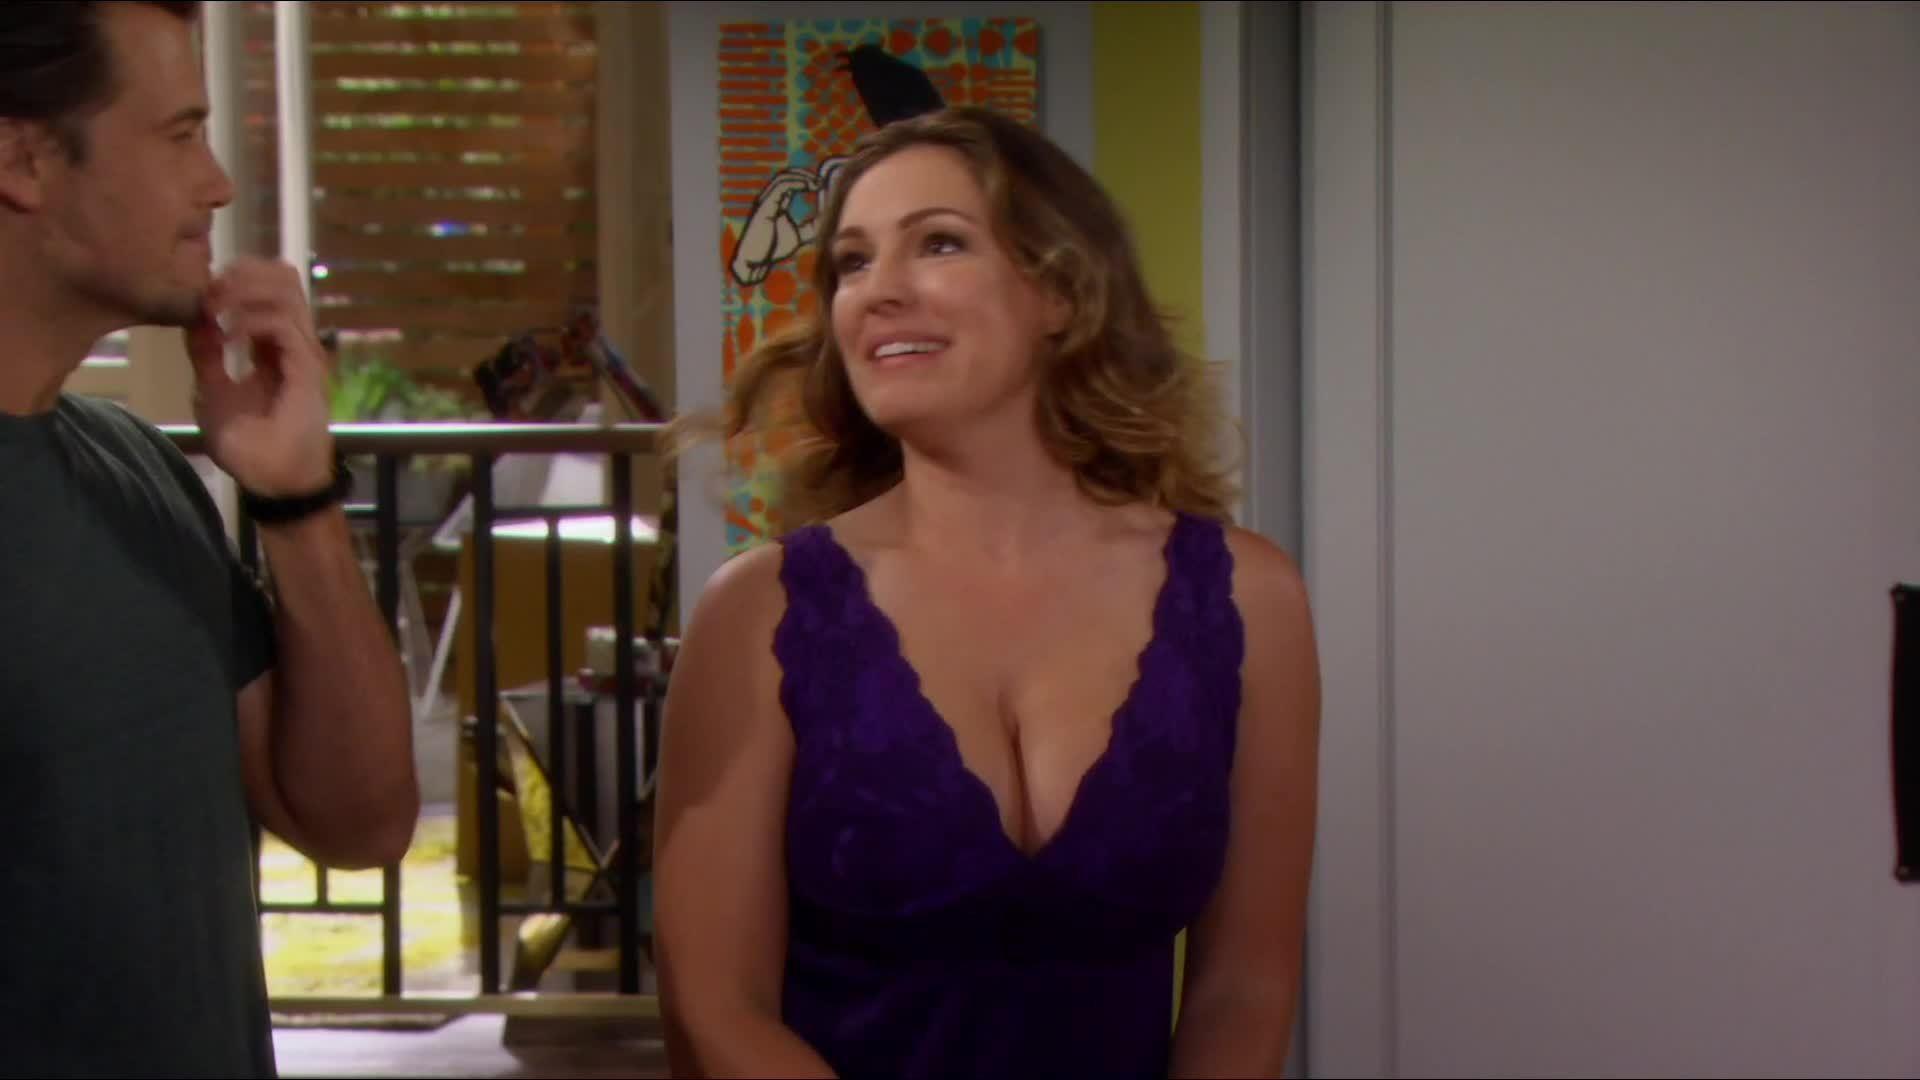 KellyBrook, kellybrook, sexyceleb, Kelly Brook's new sitcom plot (MIC) [Spoilers... I guess] (reddit) GIFs